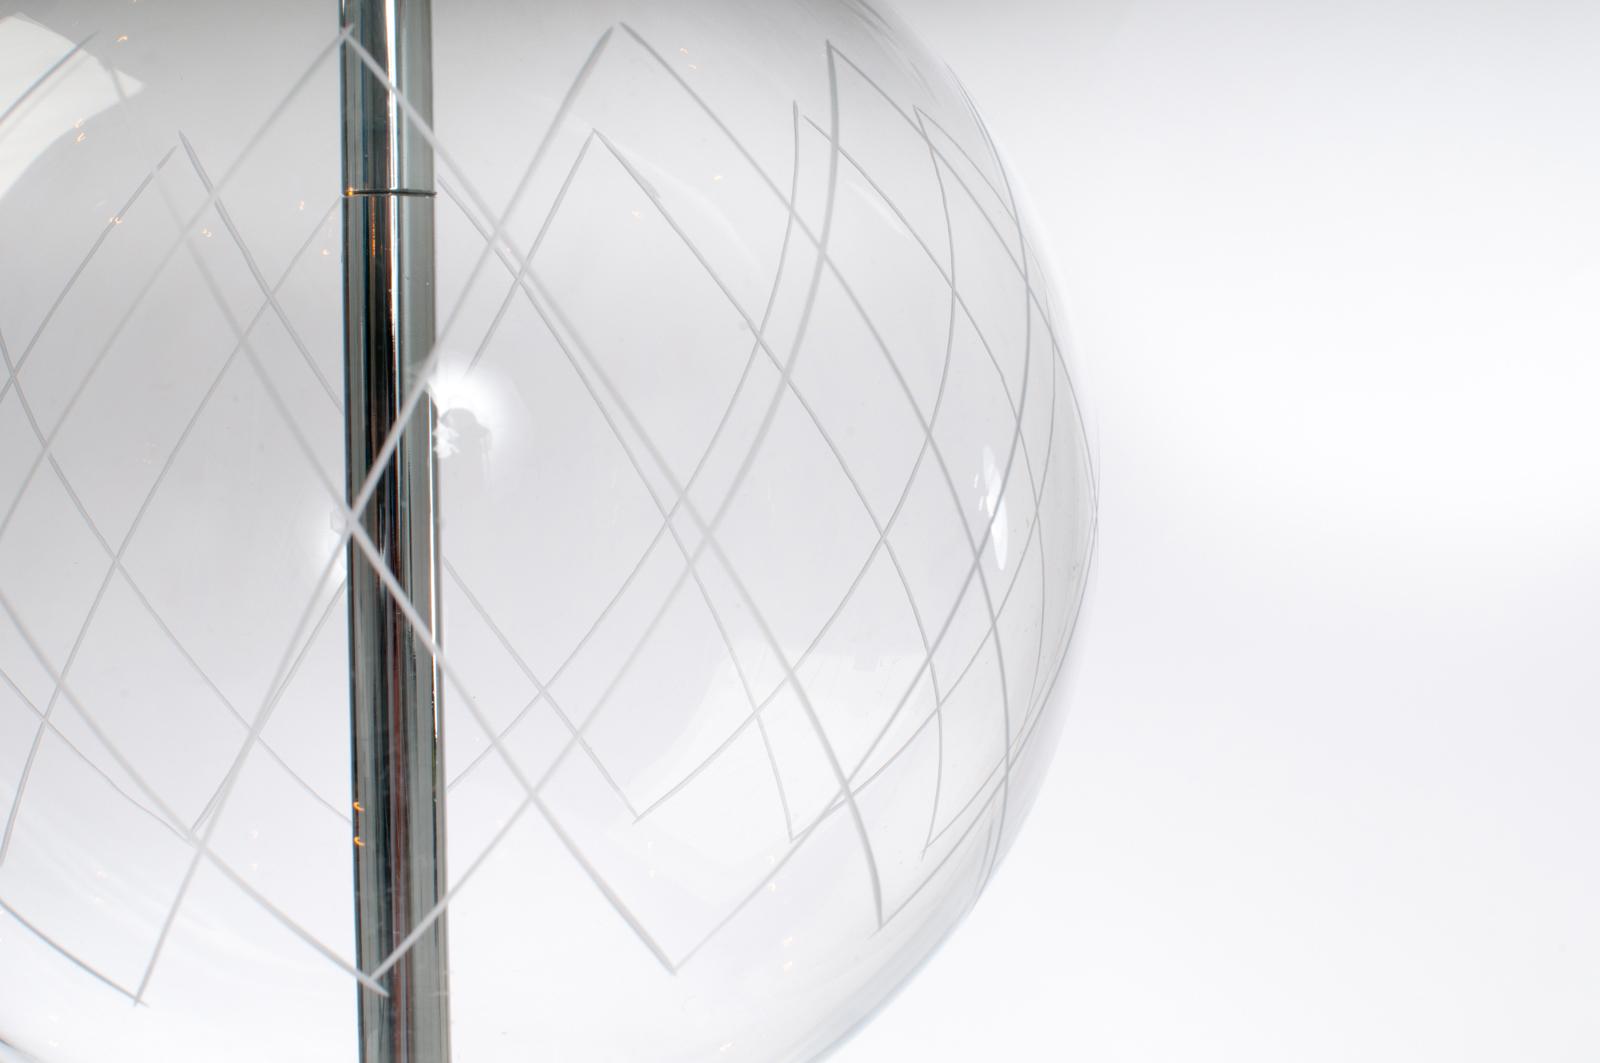 cic-lustre-chandelier-veronese-4.jpg